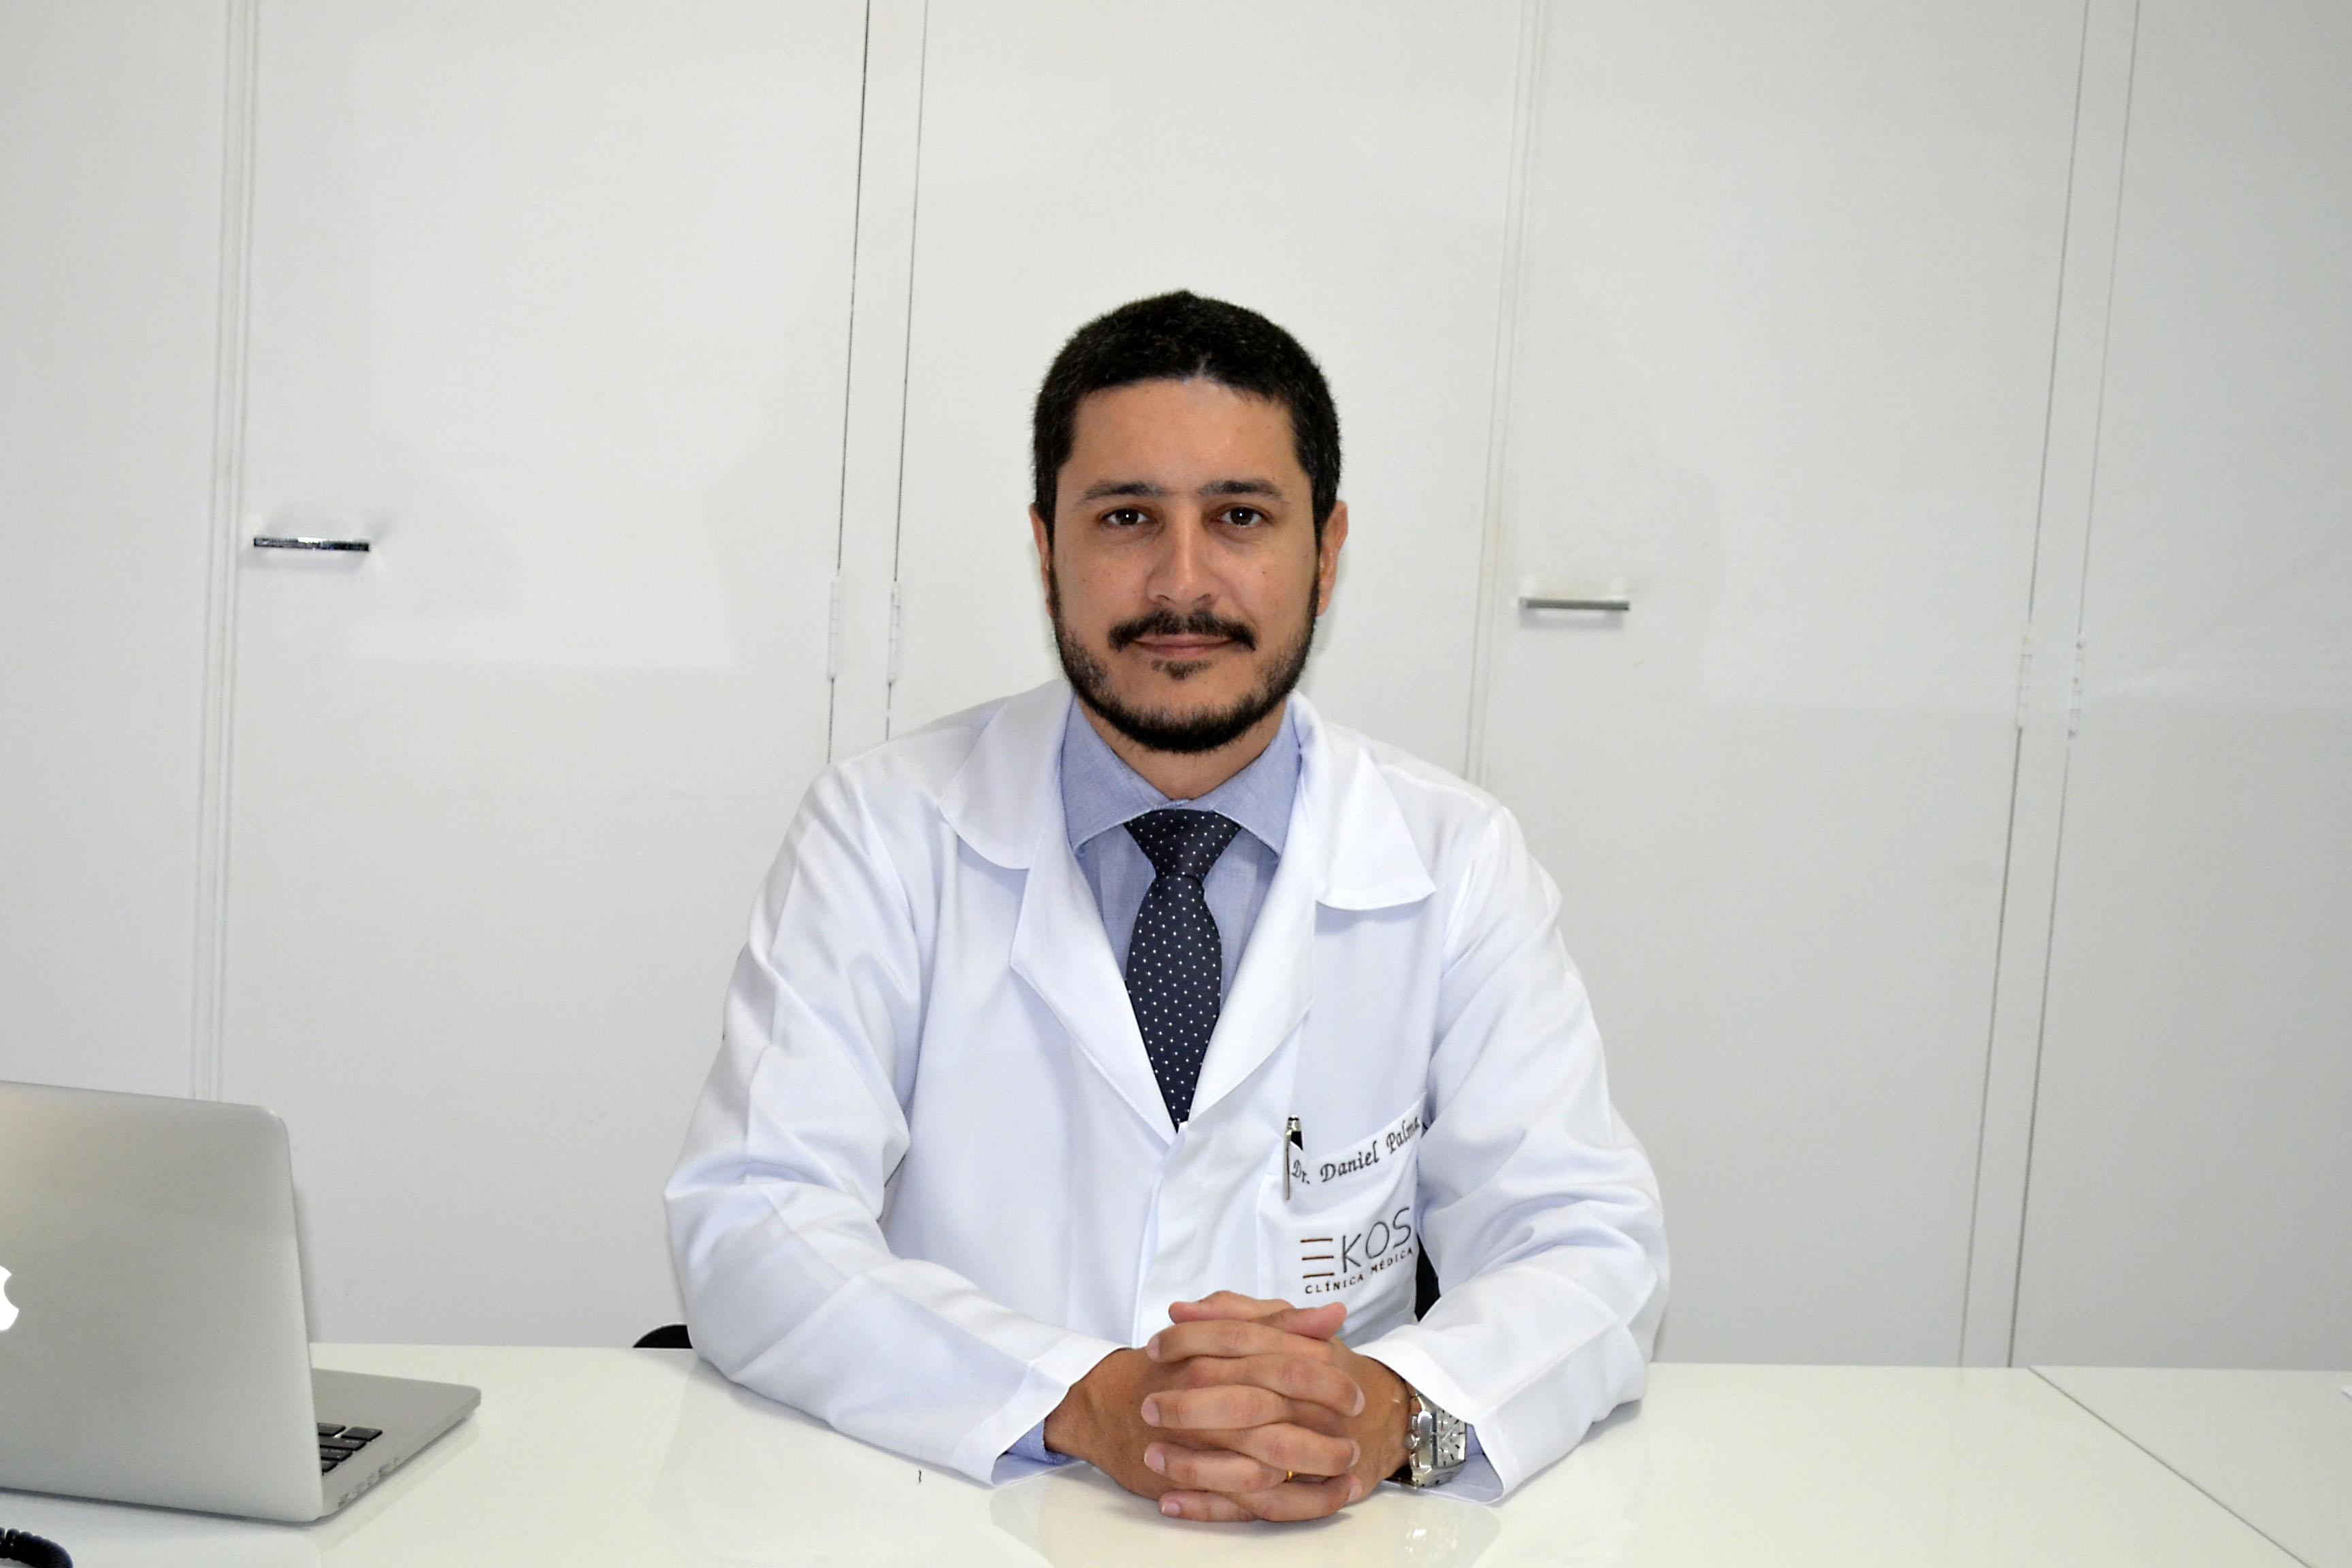 Drº Daniel Pedroso Palma – Cirurgia Aparelho Digestivo - CRM: 120.898 RQE: 47918